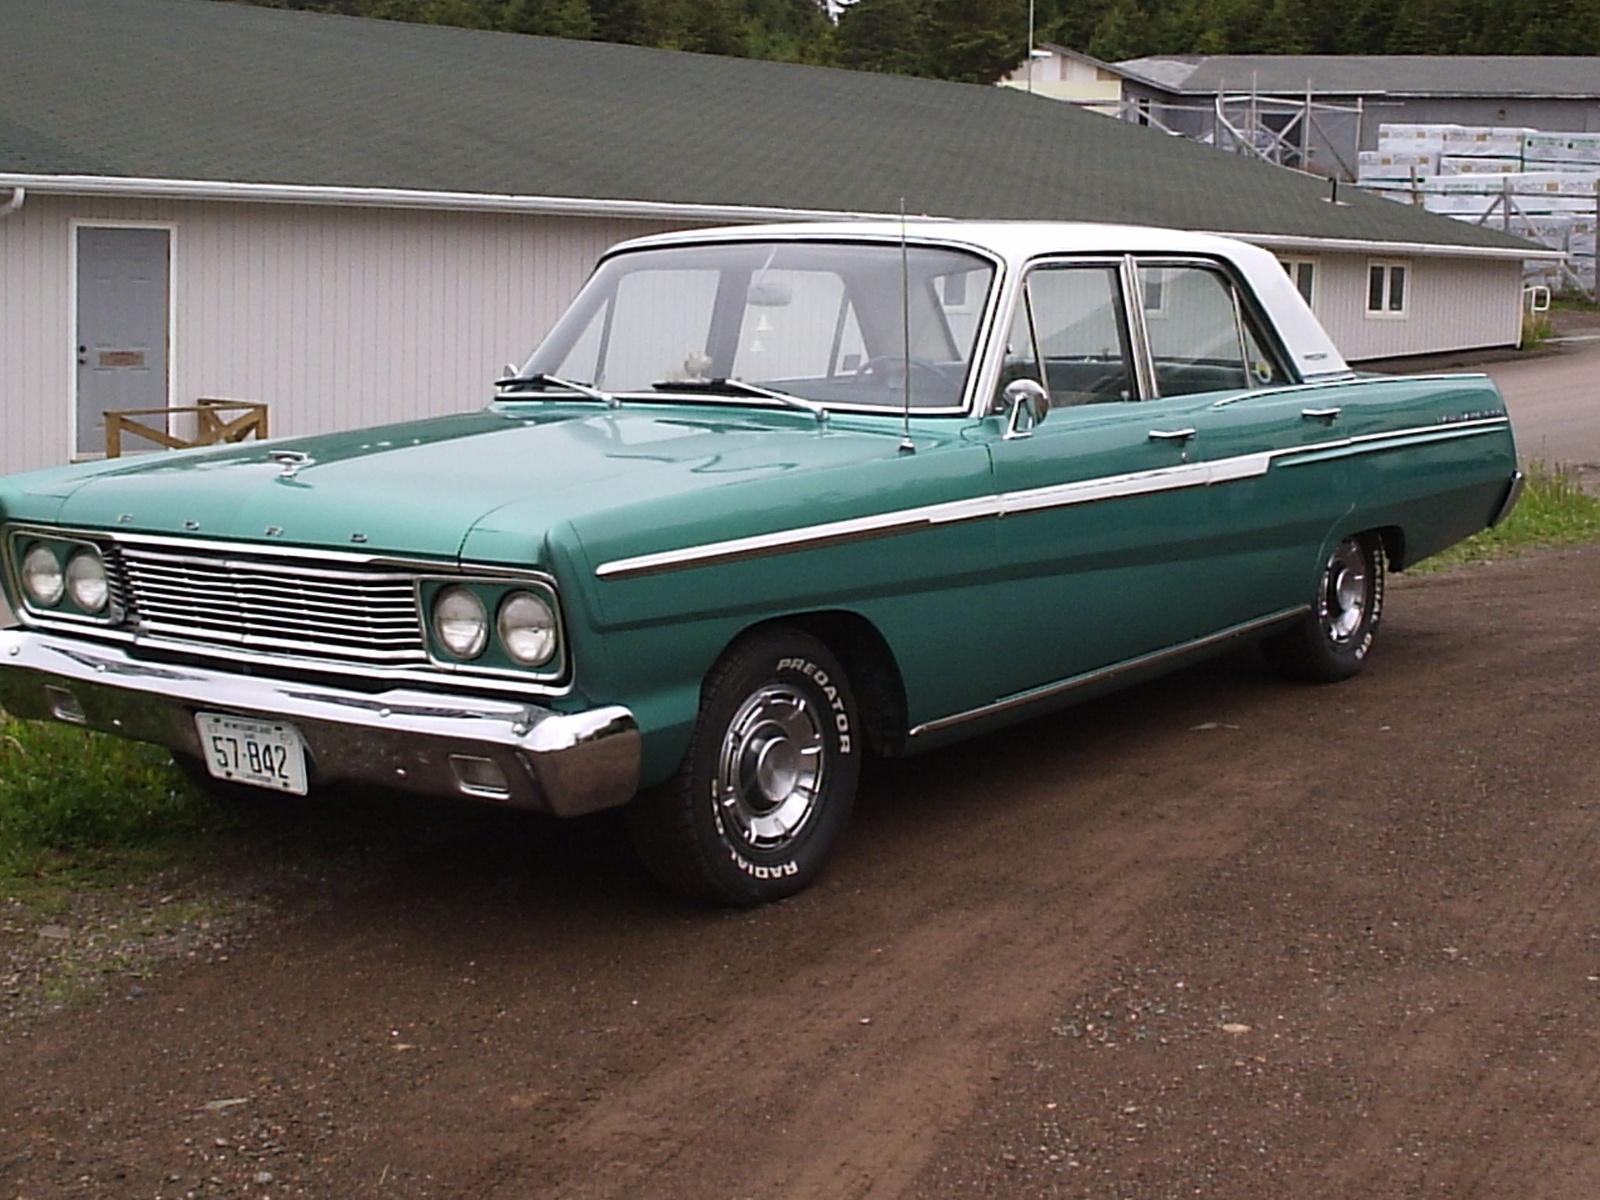 1964 Ford Fairlane For Sale On Craigslist 2014 | Autos Post